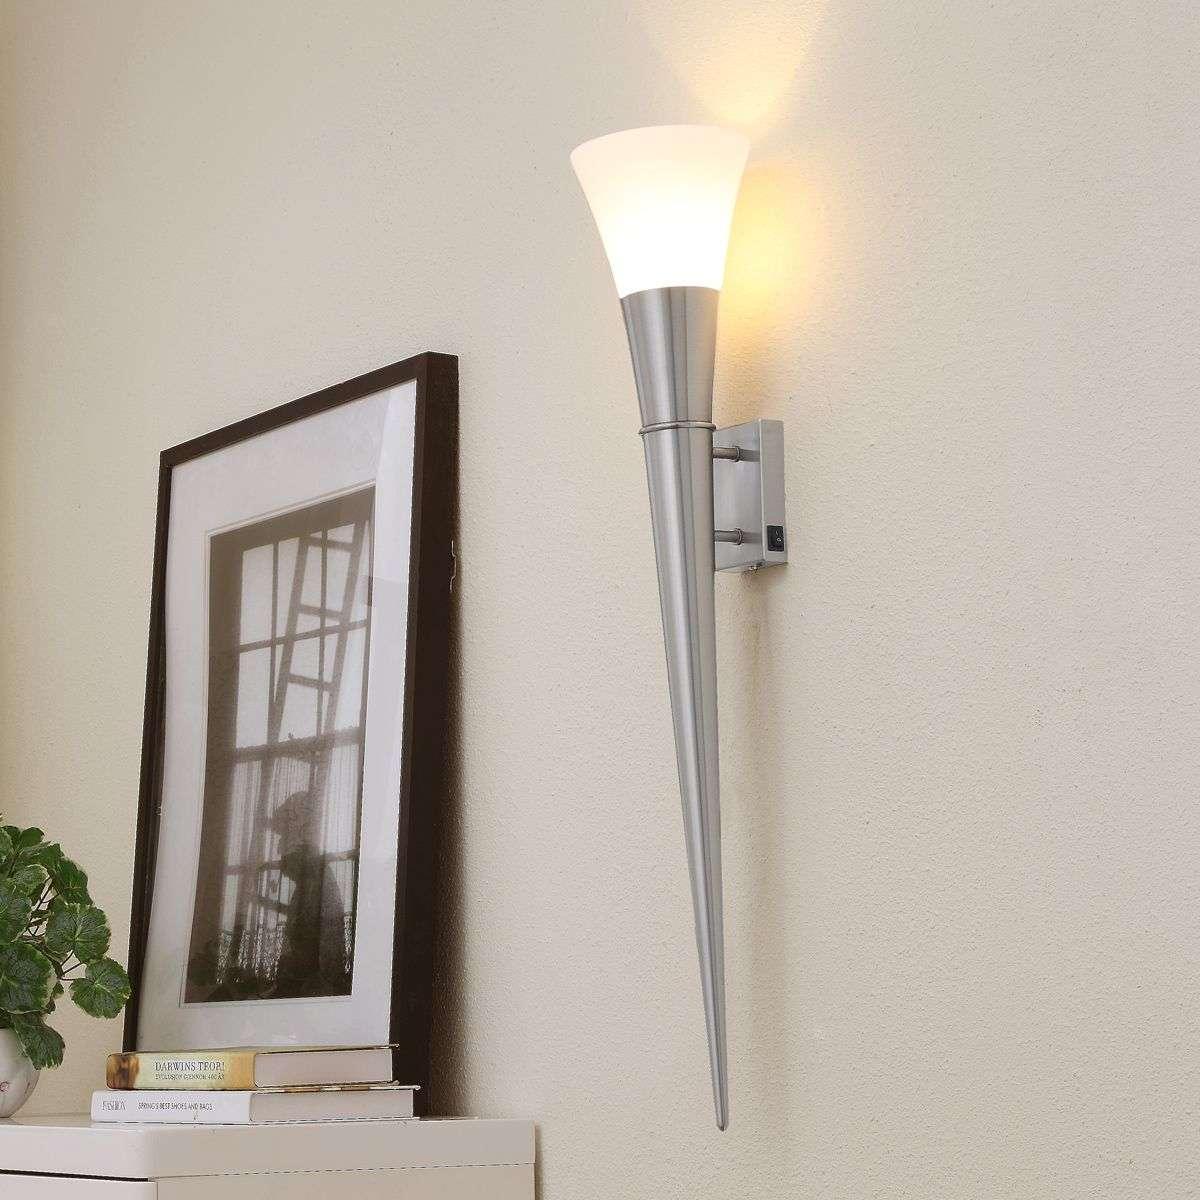 Large neel led wall torch in matt nickel lights large neel led wall torch in matt nickel 9620090 31 audiocablefo